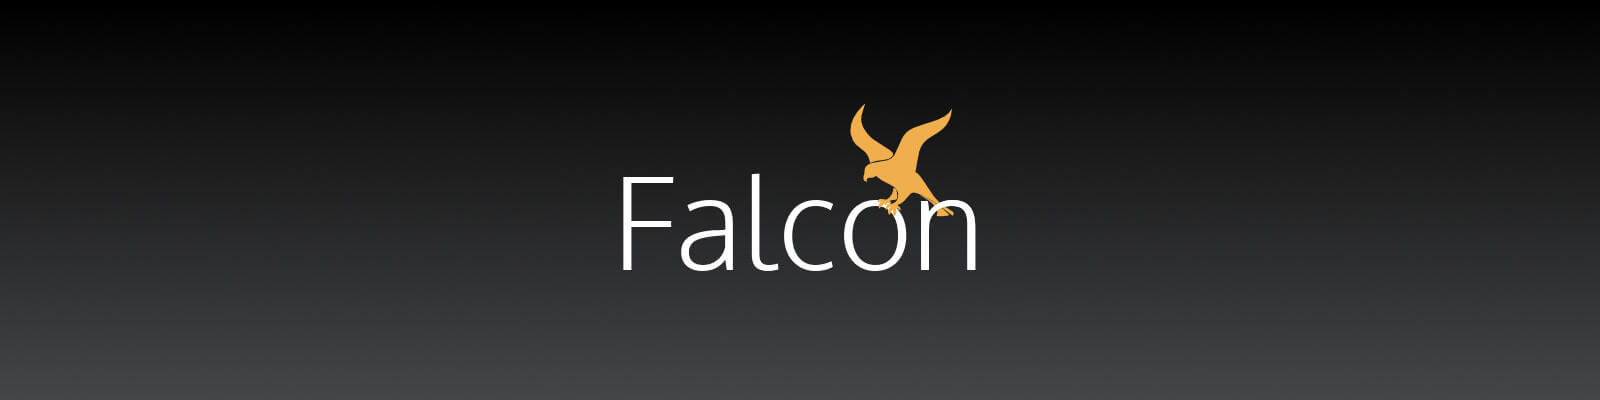 Falcon web framework logo